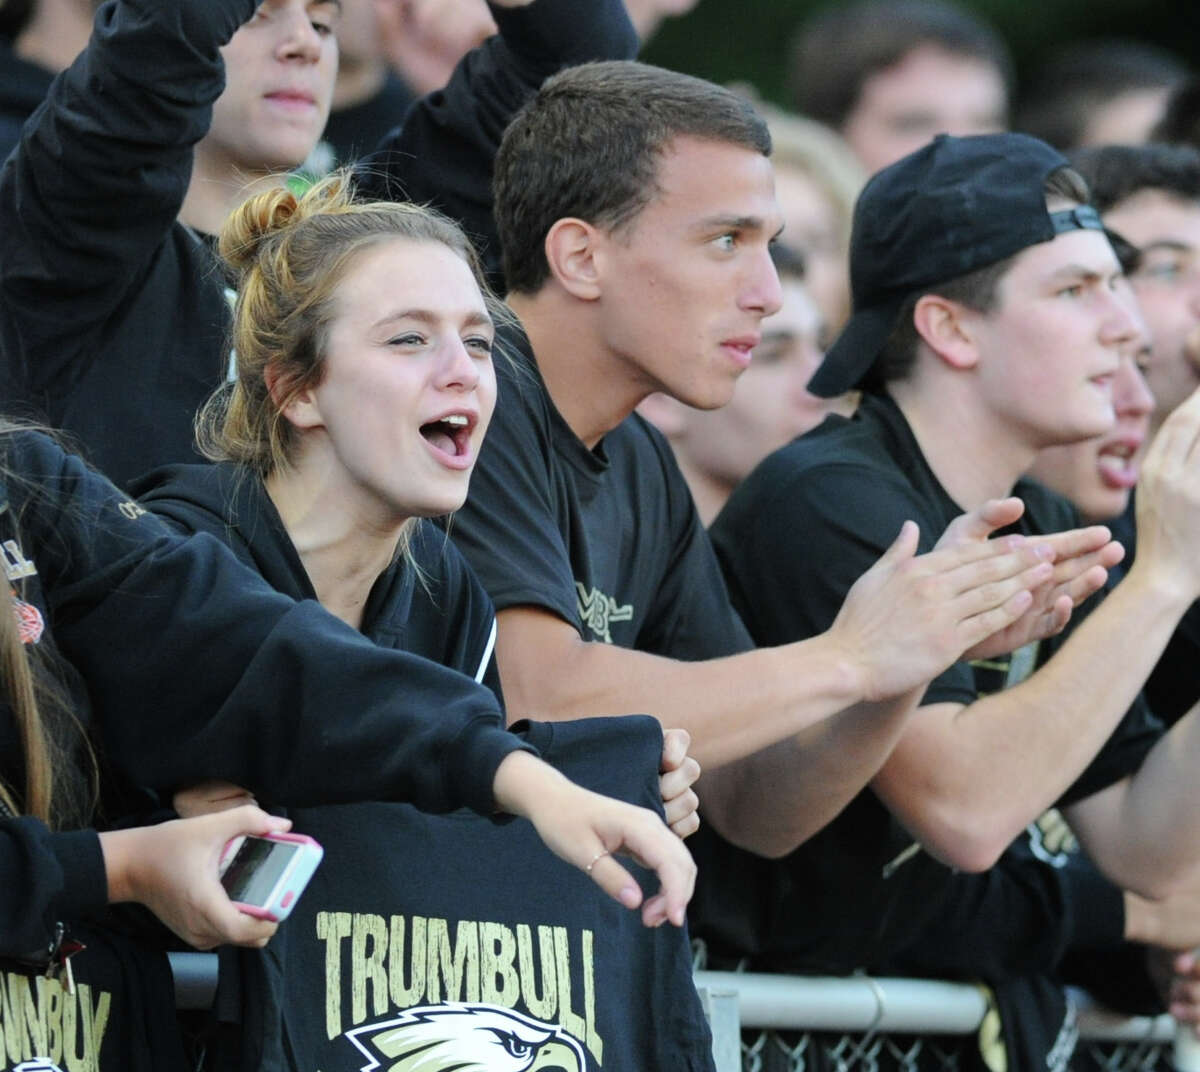 High School football game bewteen Trumbull High School and Shelton High School at Trumbull High School, Conn., Friday, Sept. 12, 2014.